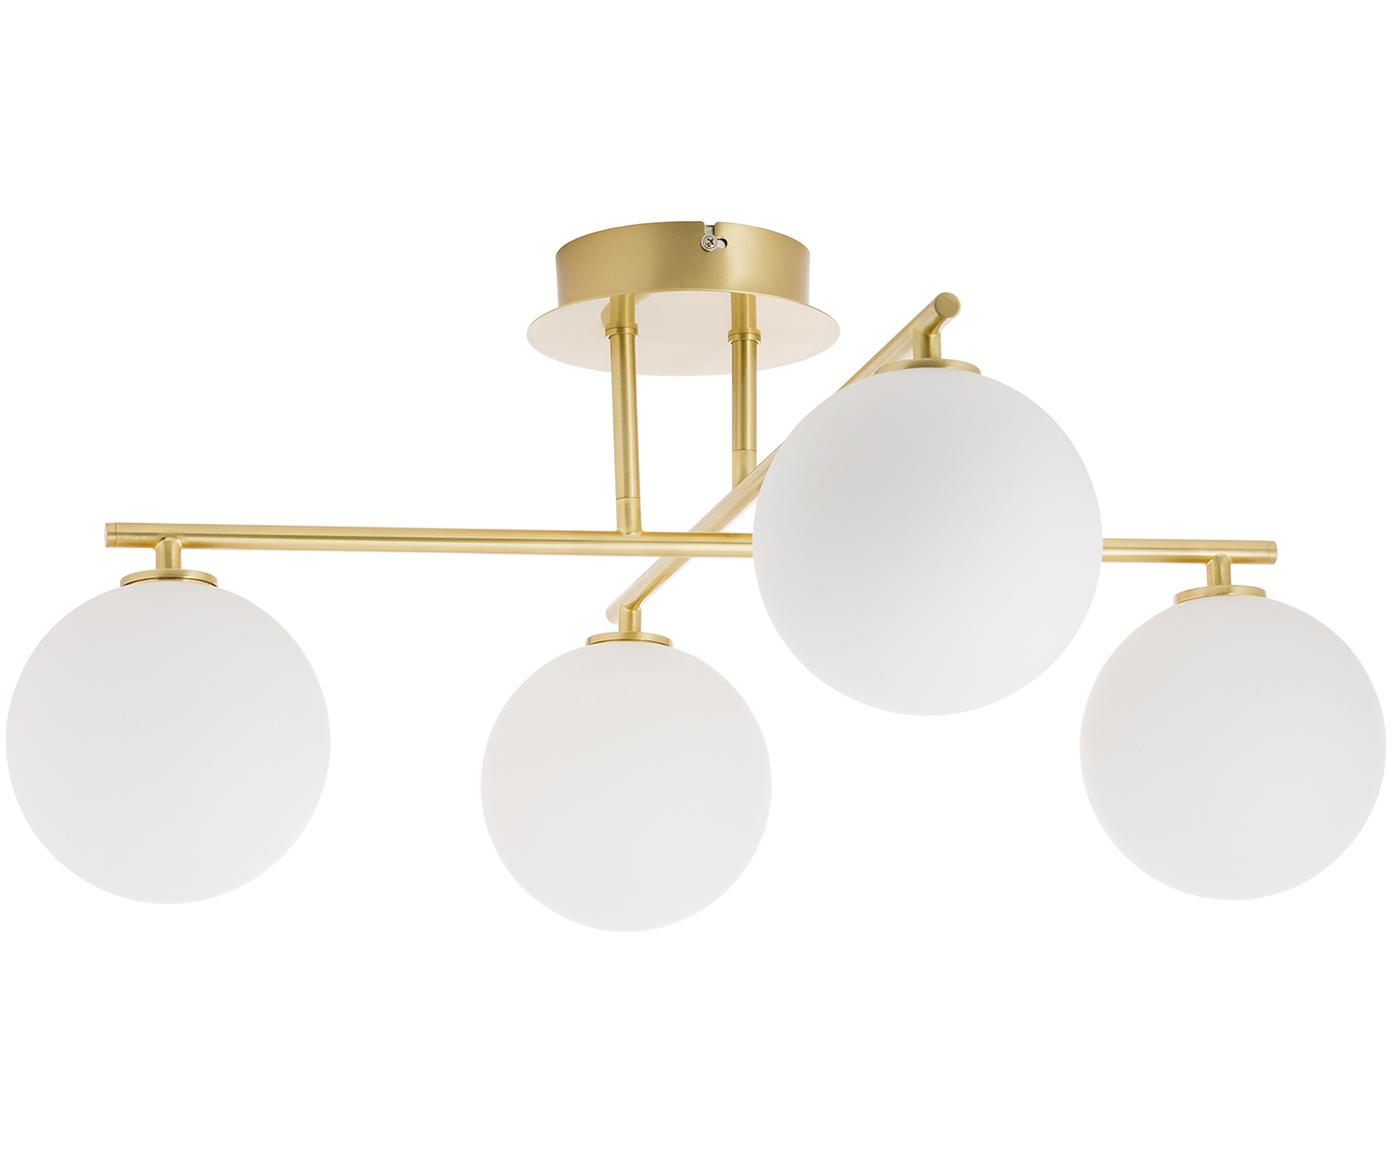 Lampada da soffitto Atlanta, Baldacchino: metallo ottonato, Bianco, ottone, Larg. 65 x Alt. 30 cm